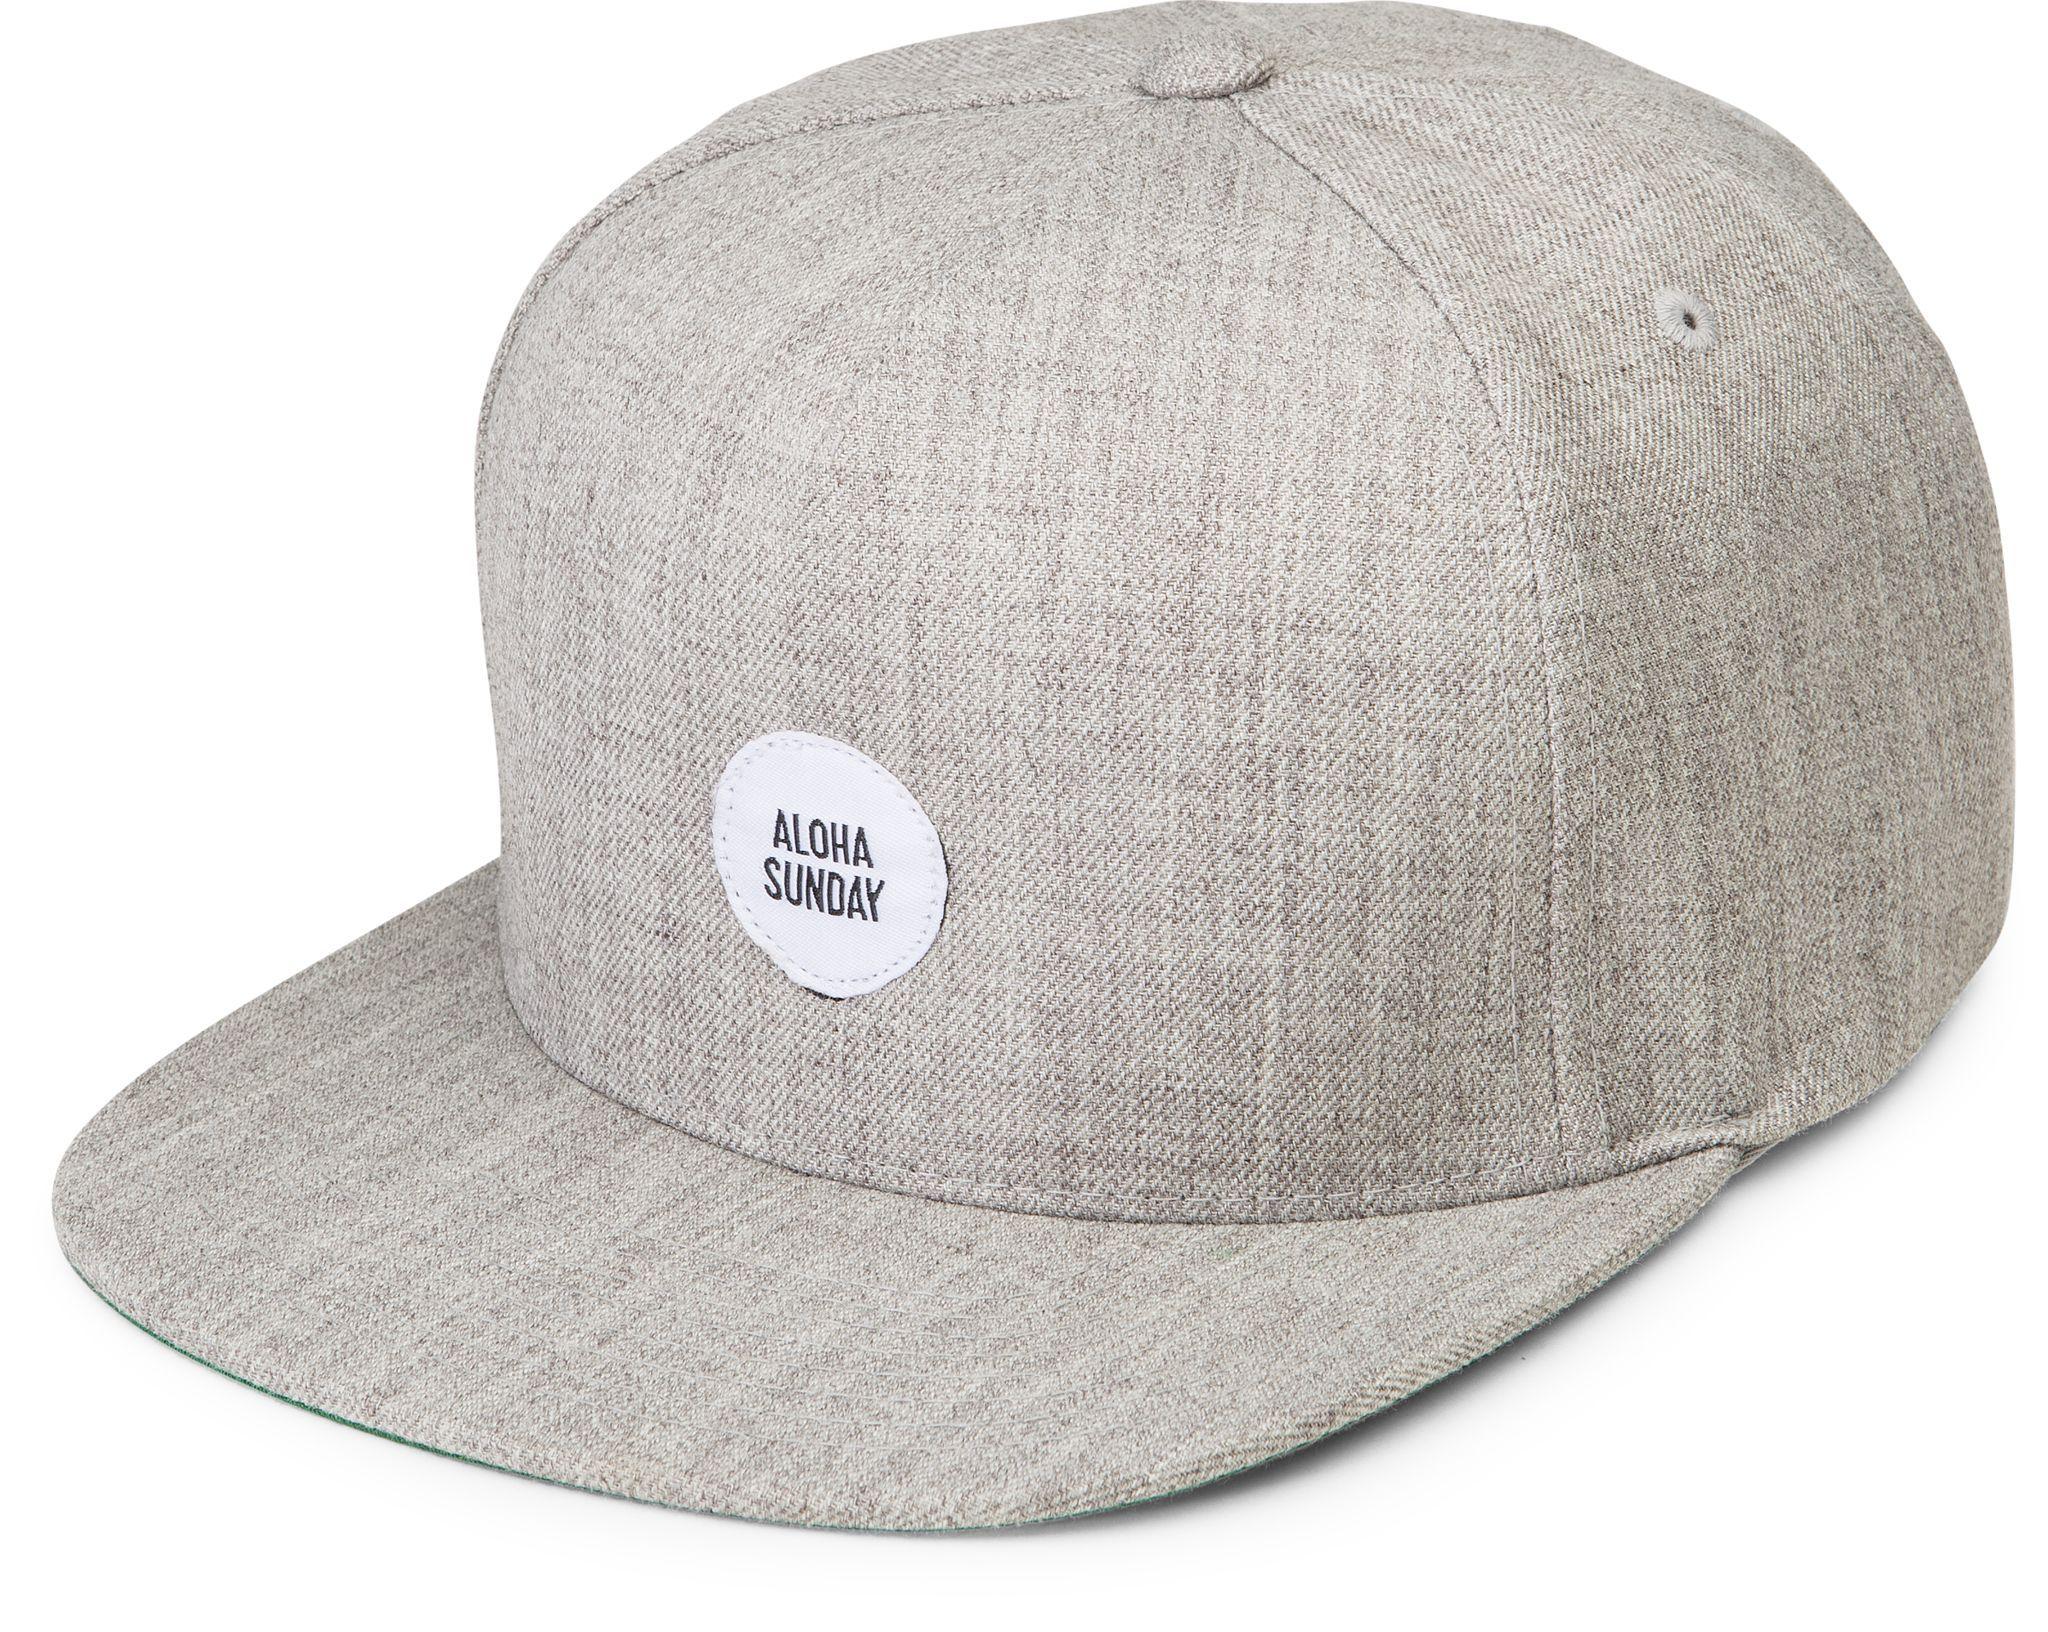 ALOHA SUNDAY SIGNAL CAP  e5ad7966d48